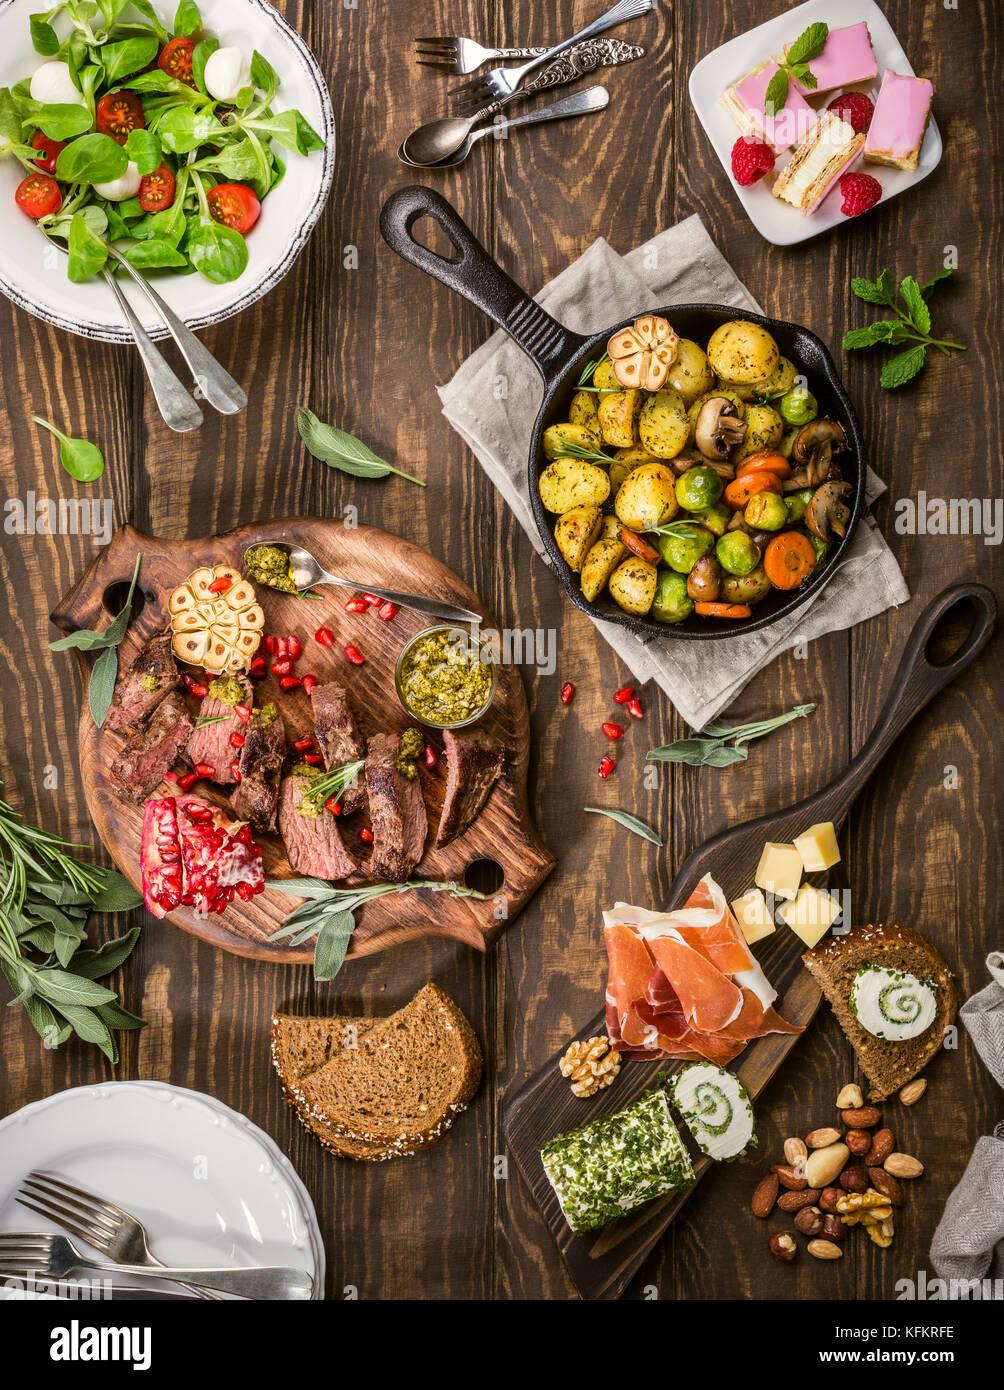 Köstliches Abendessen Tabelle Stockbild